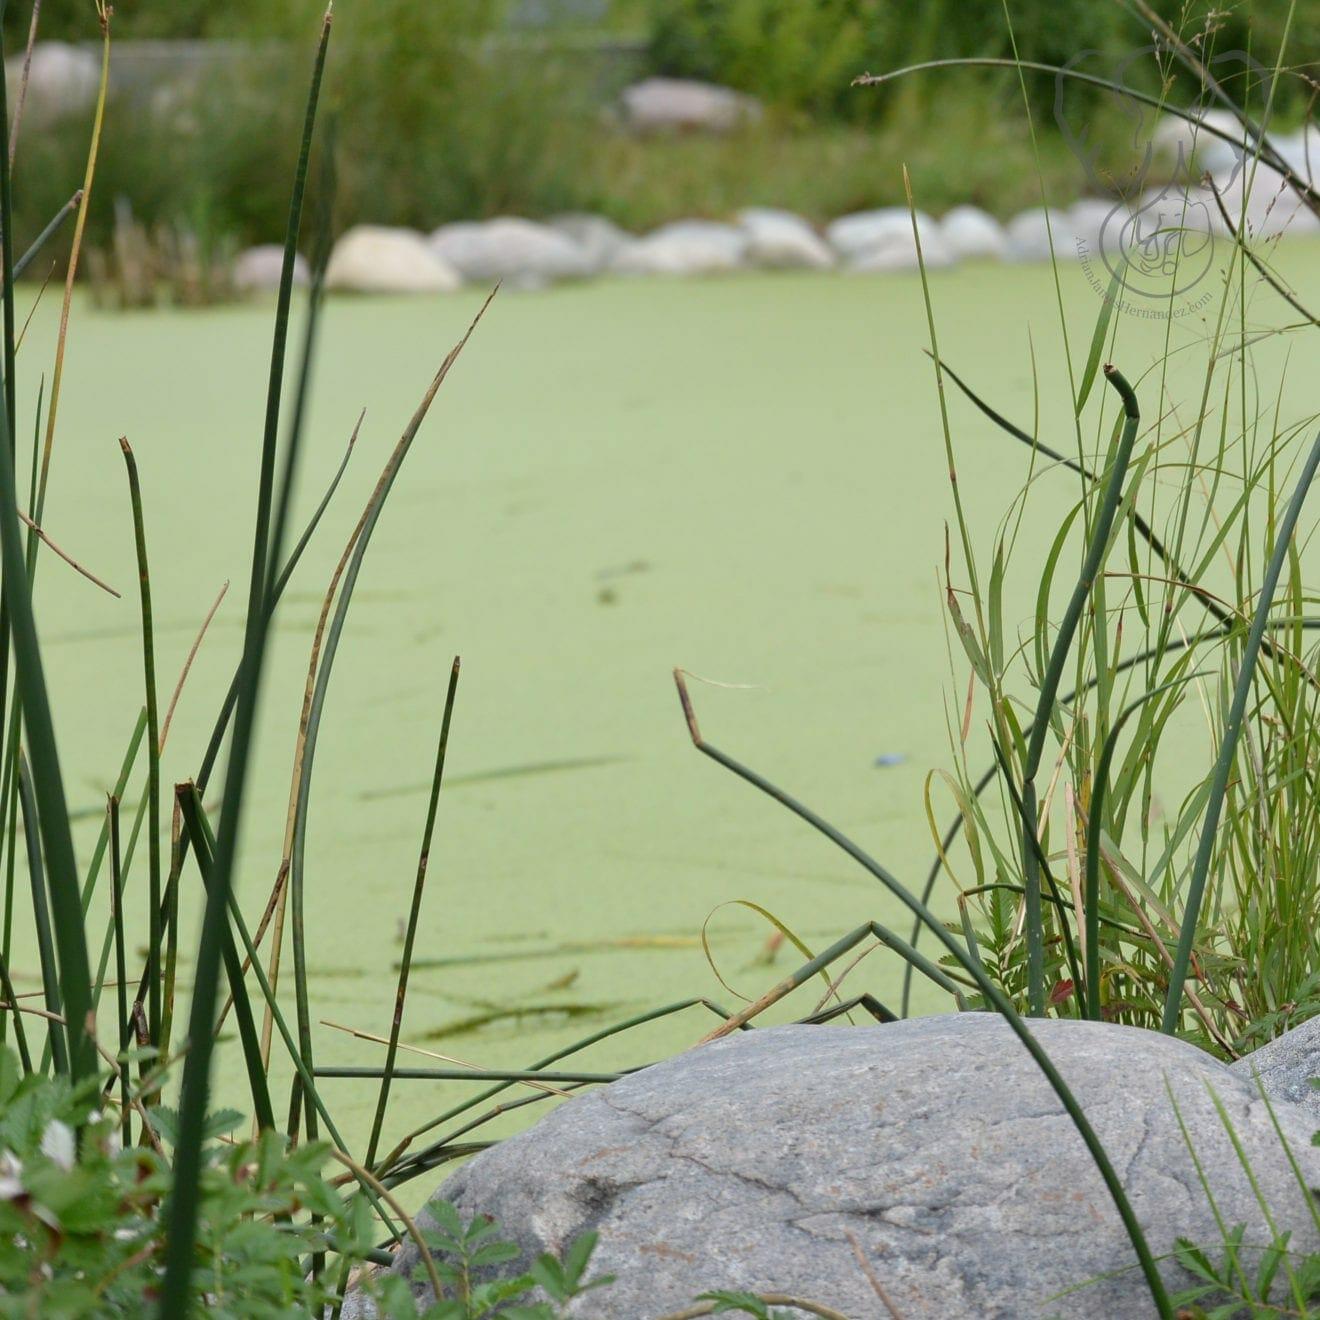 Moss-covered pond water in Assiniboine Park, Winnipeg, Manitoba (Miranda Hernandez)